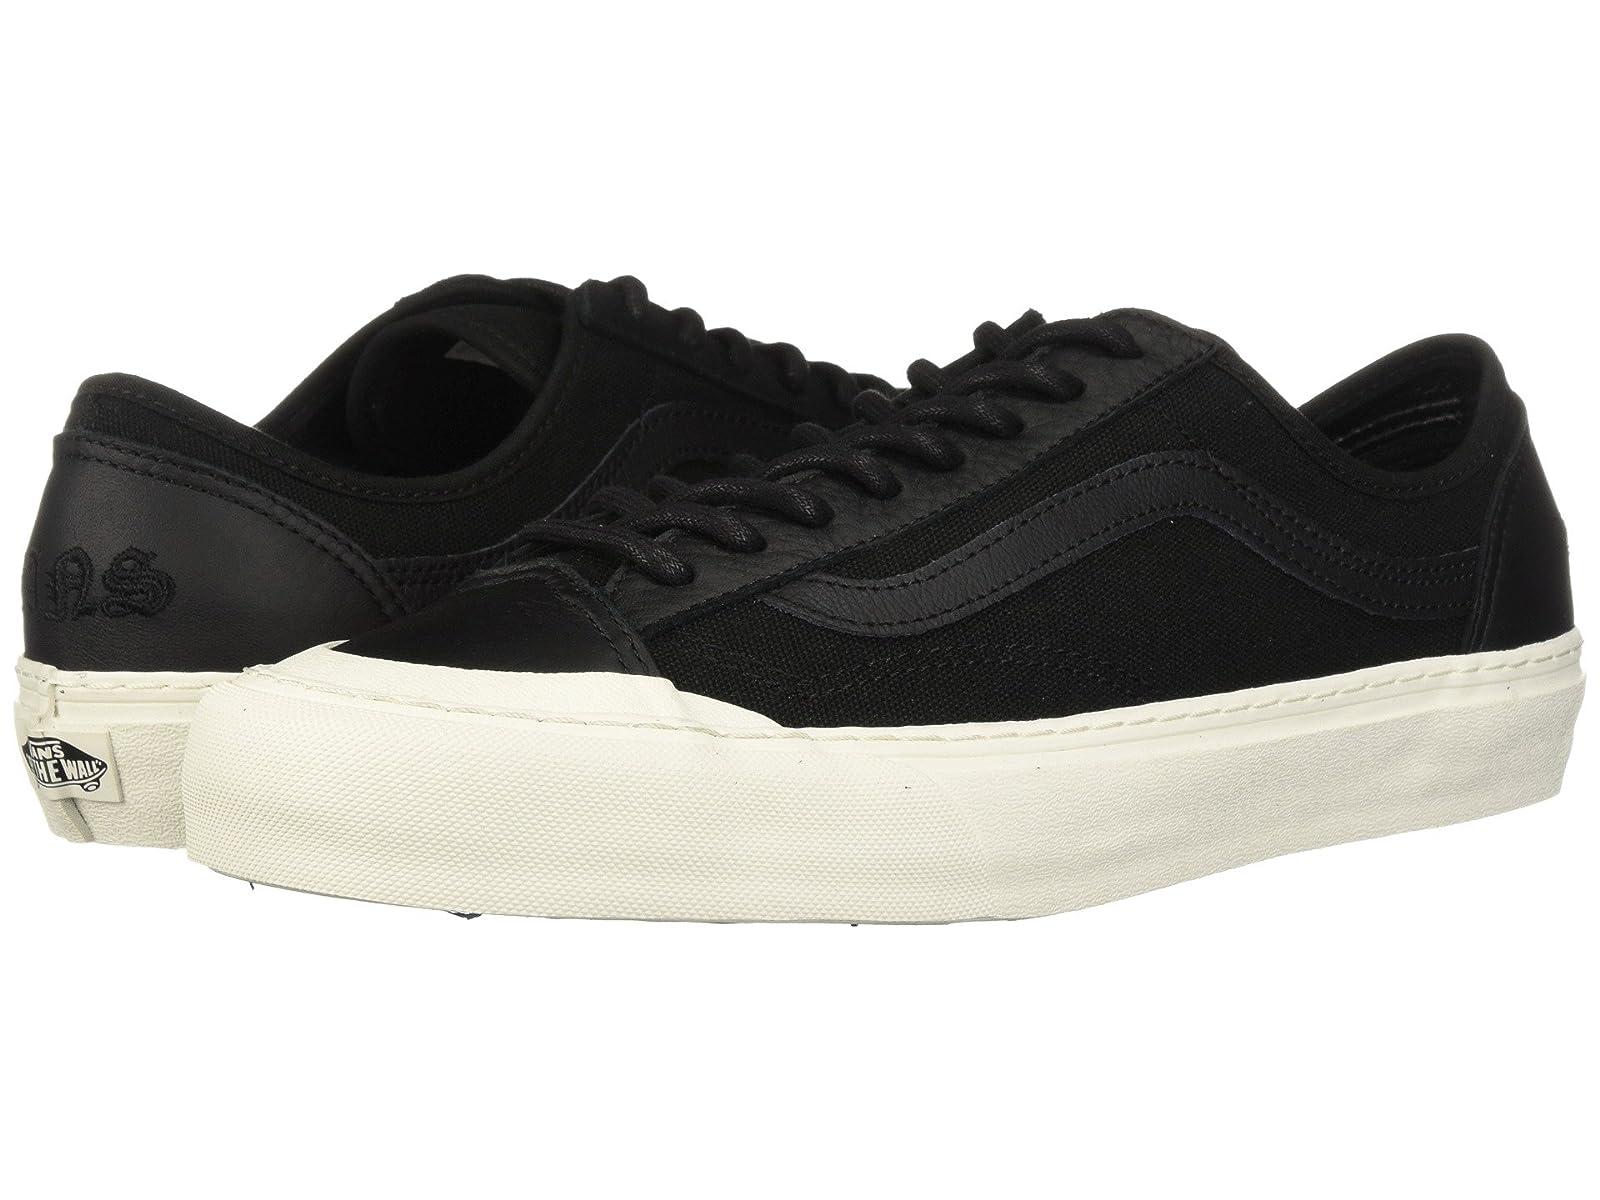 Vans Style 36 Decon SFAtmospheric grades have affordable shoes